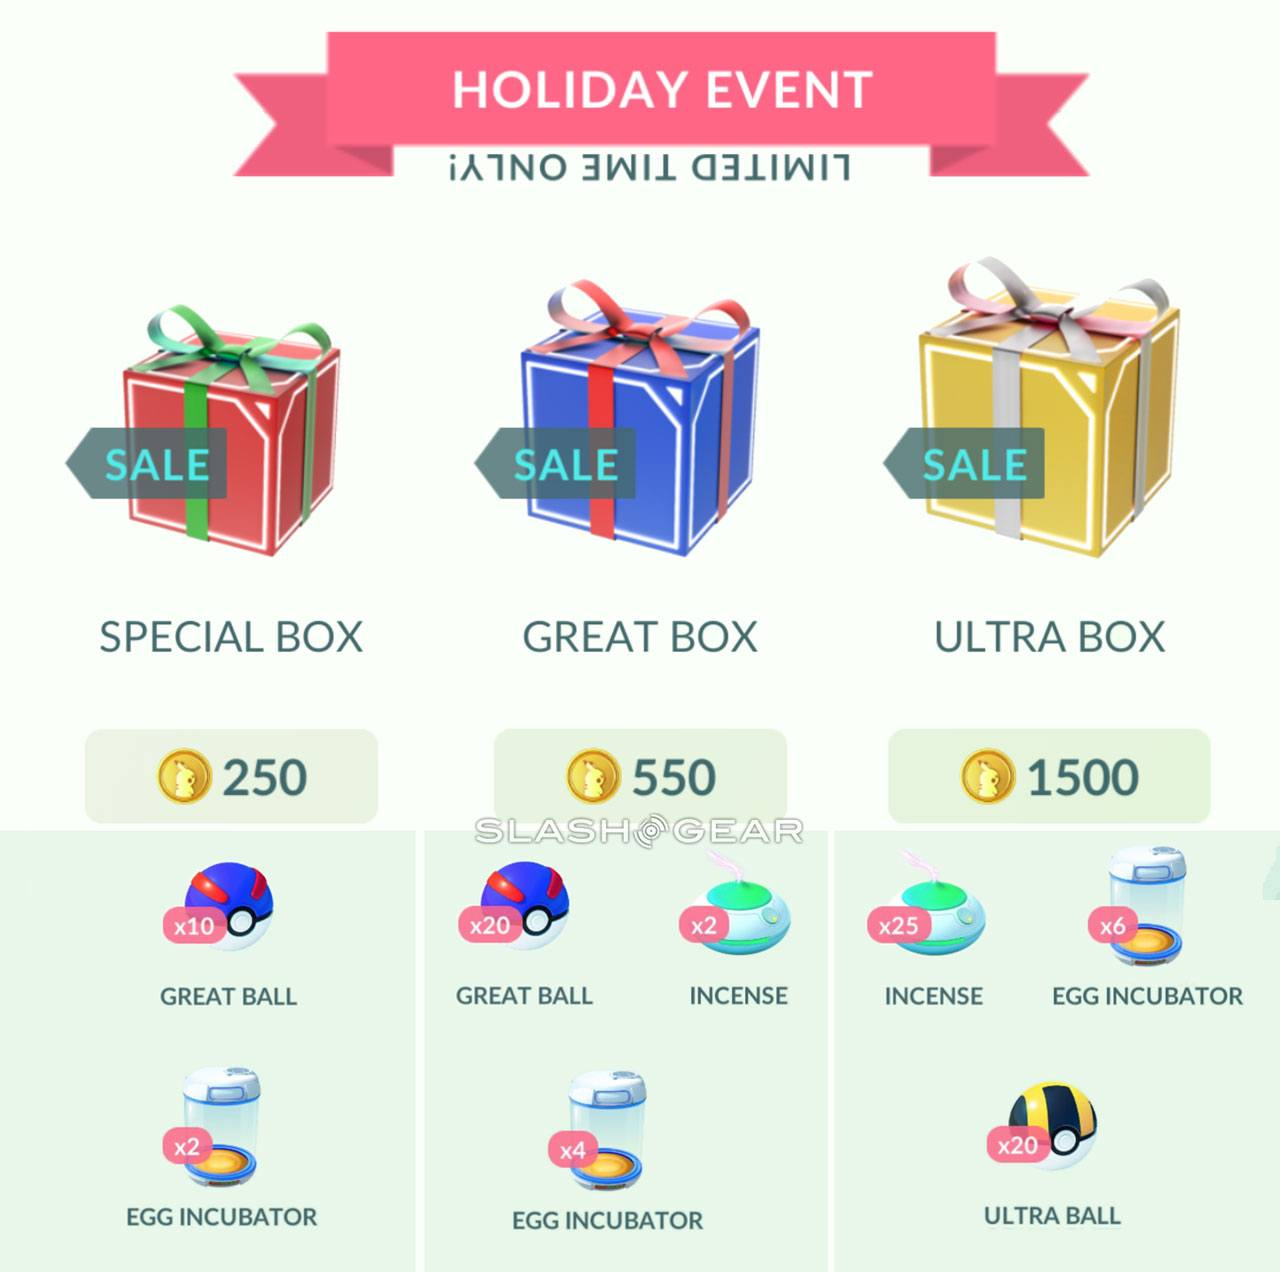 Pokemon Go Christmas Boxes.Pokemon Go Holiday Box Guide Ending 2016 With A Bang